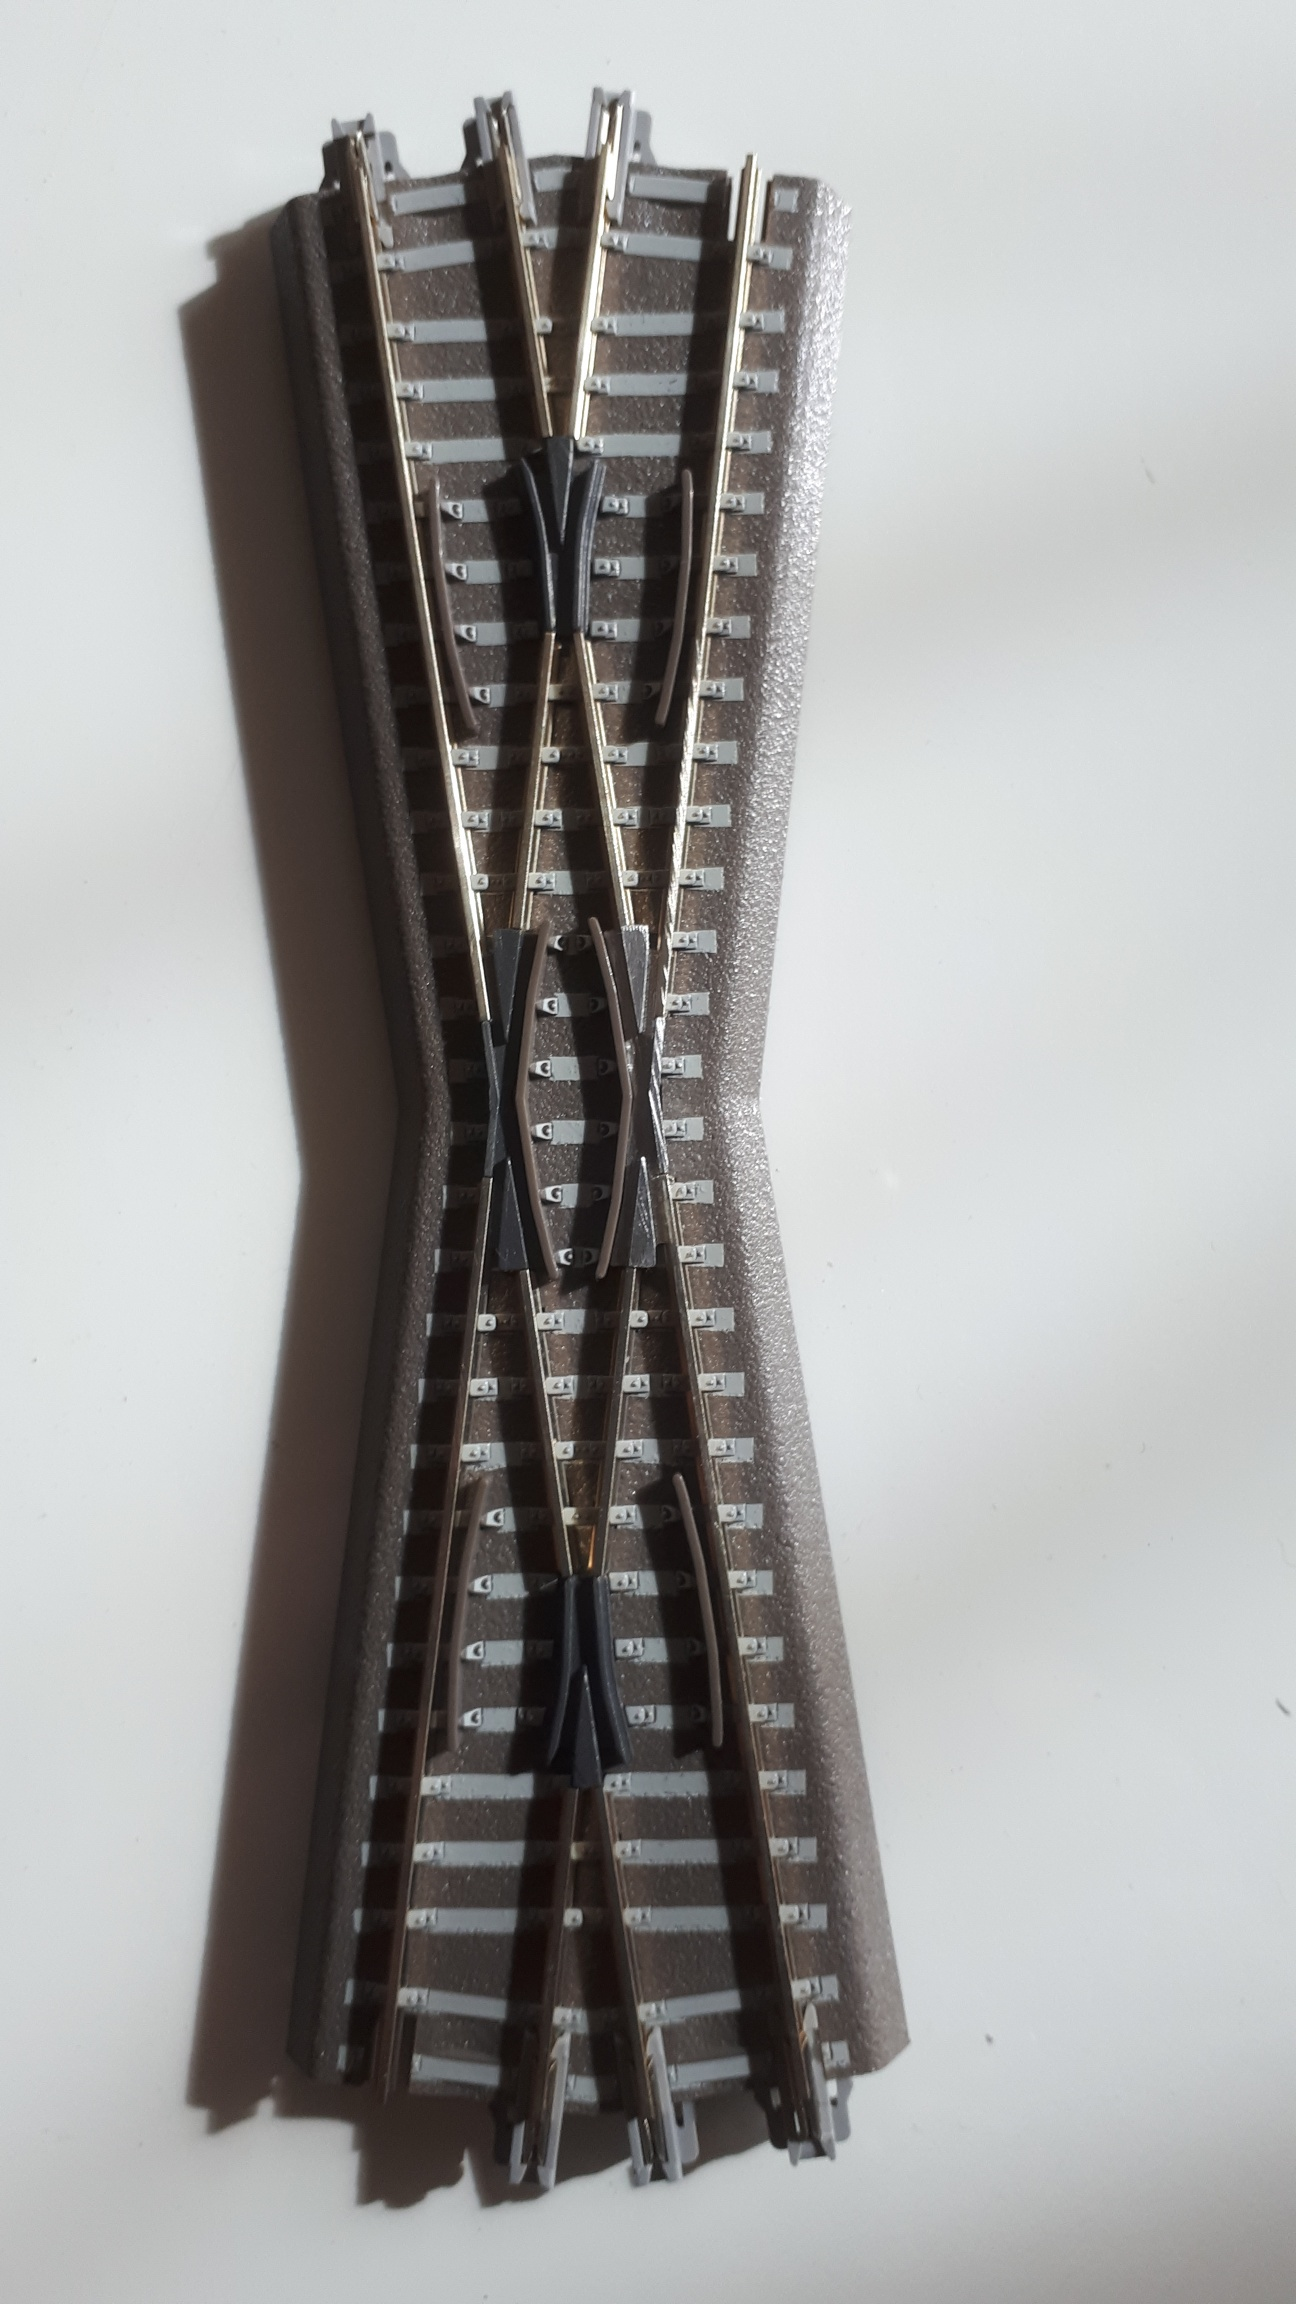 Elektrofrog for Tillig switch - [33021]